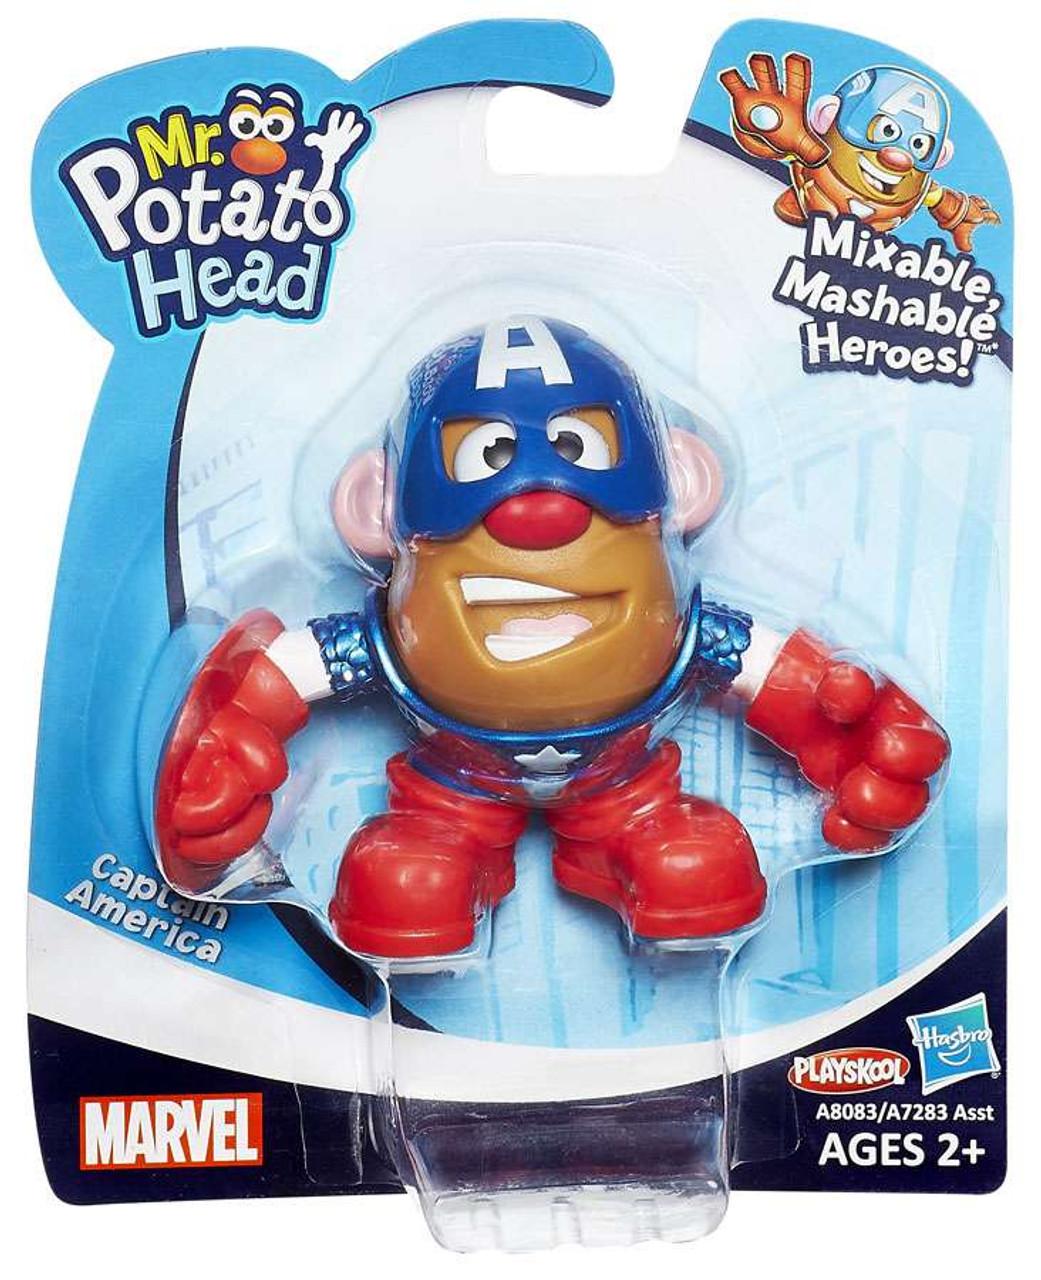 Marvel Playskool Mixable Mashable Heroes Captain America